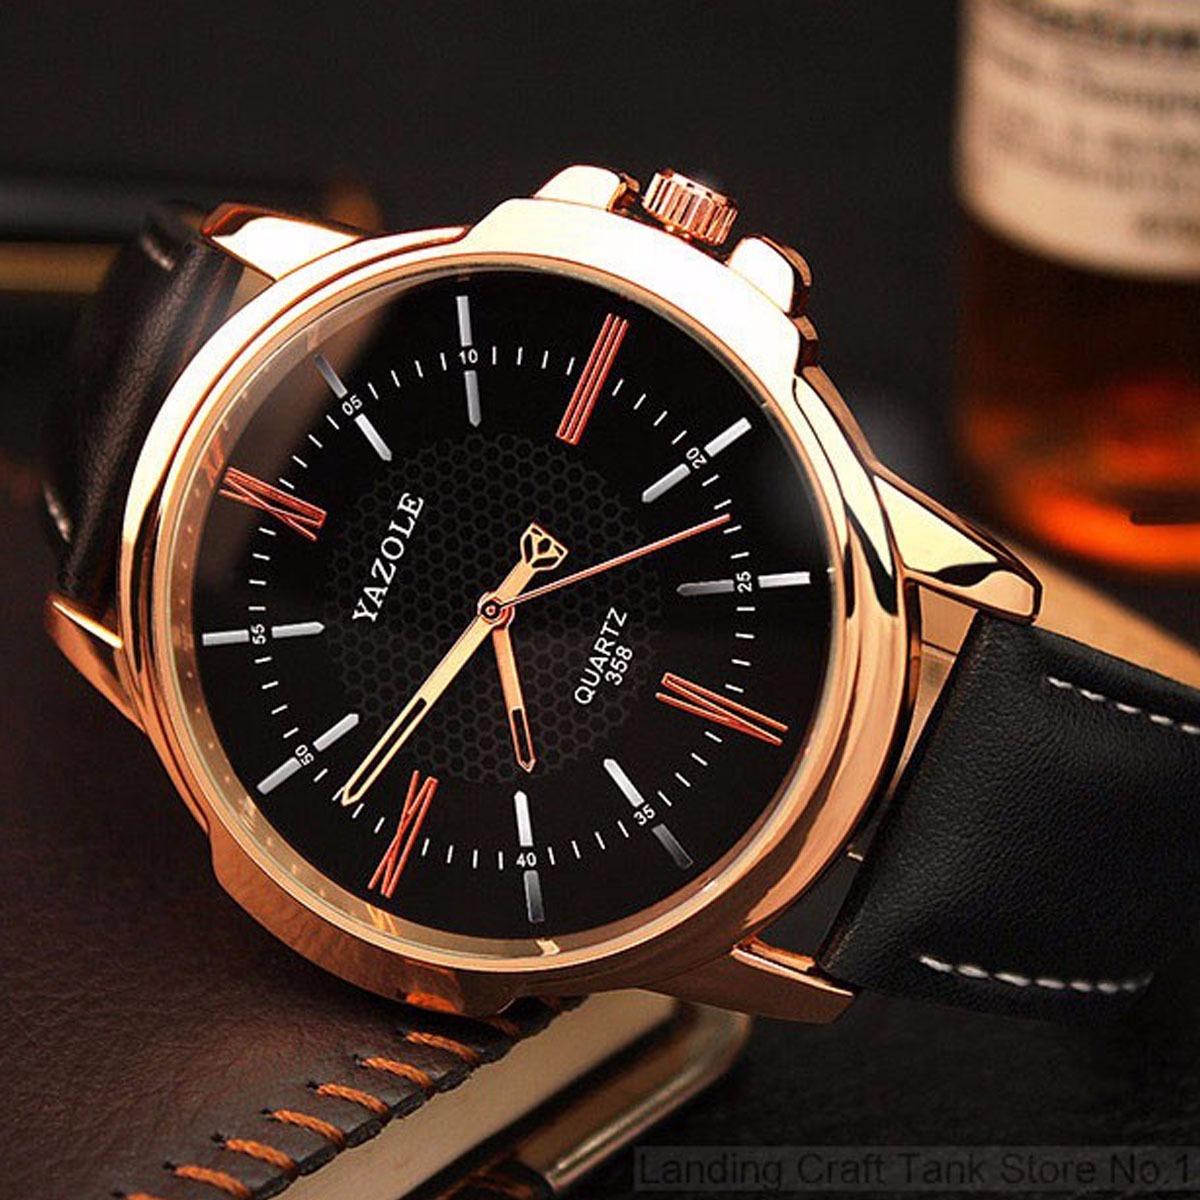 c7941a4c97c relógio masculino luxo yazole pulso social pulseira couro n4. Carregando  zoom.